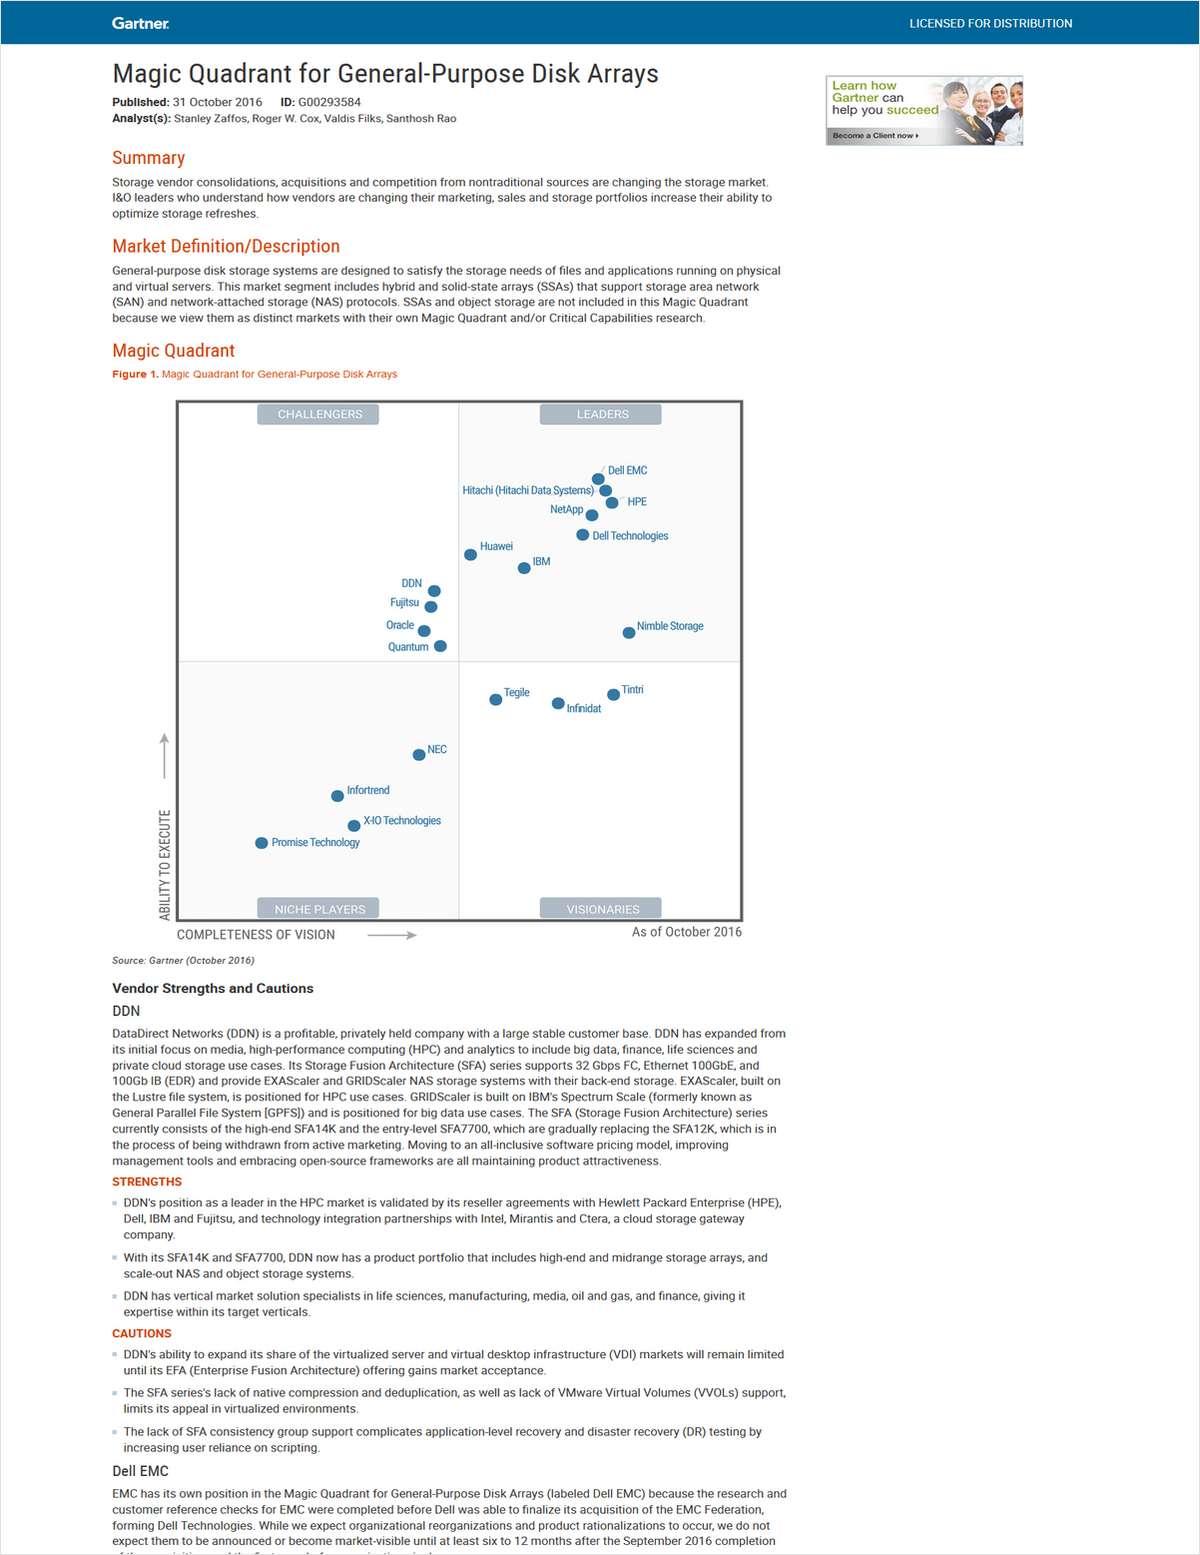 Gartner magic quadrant trading systems